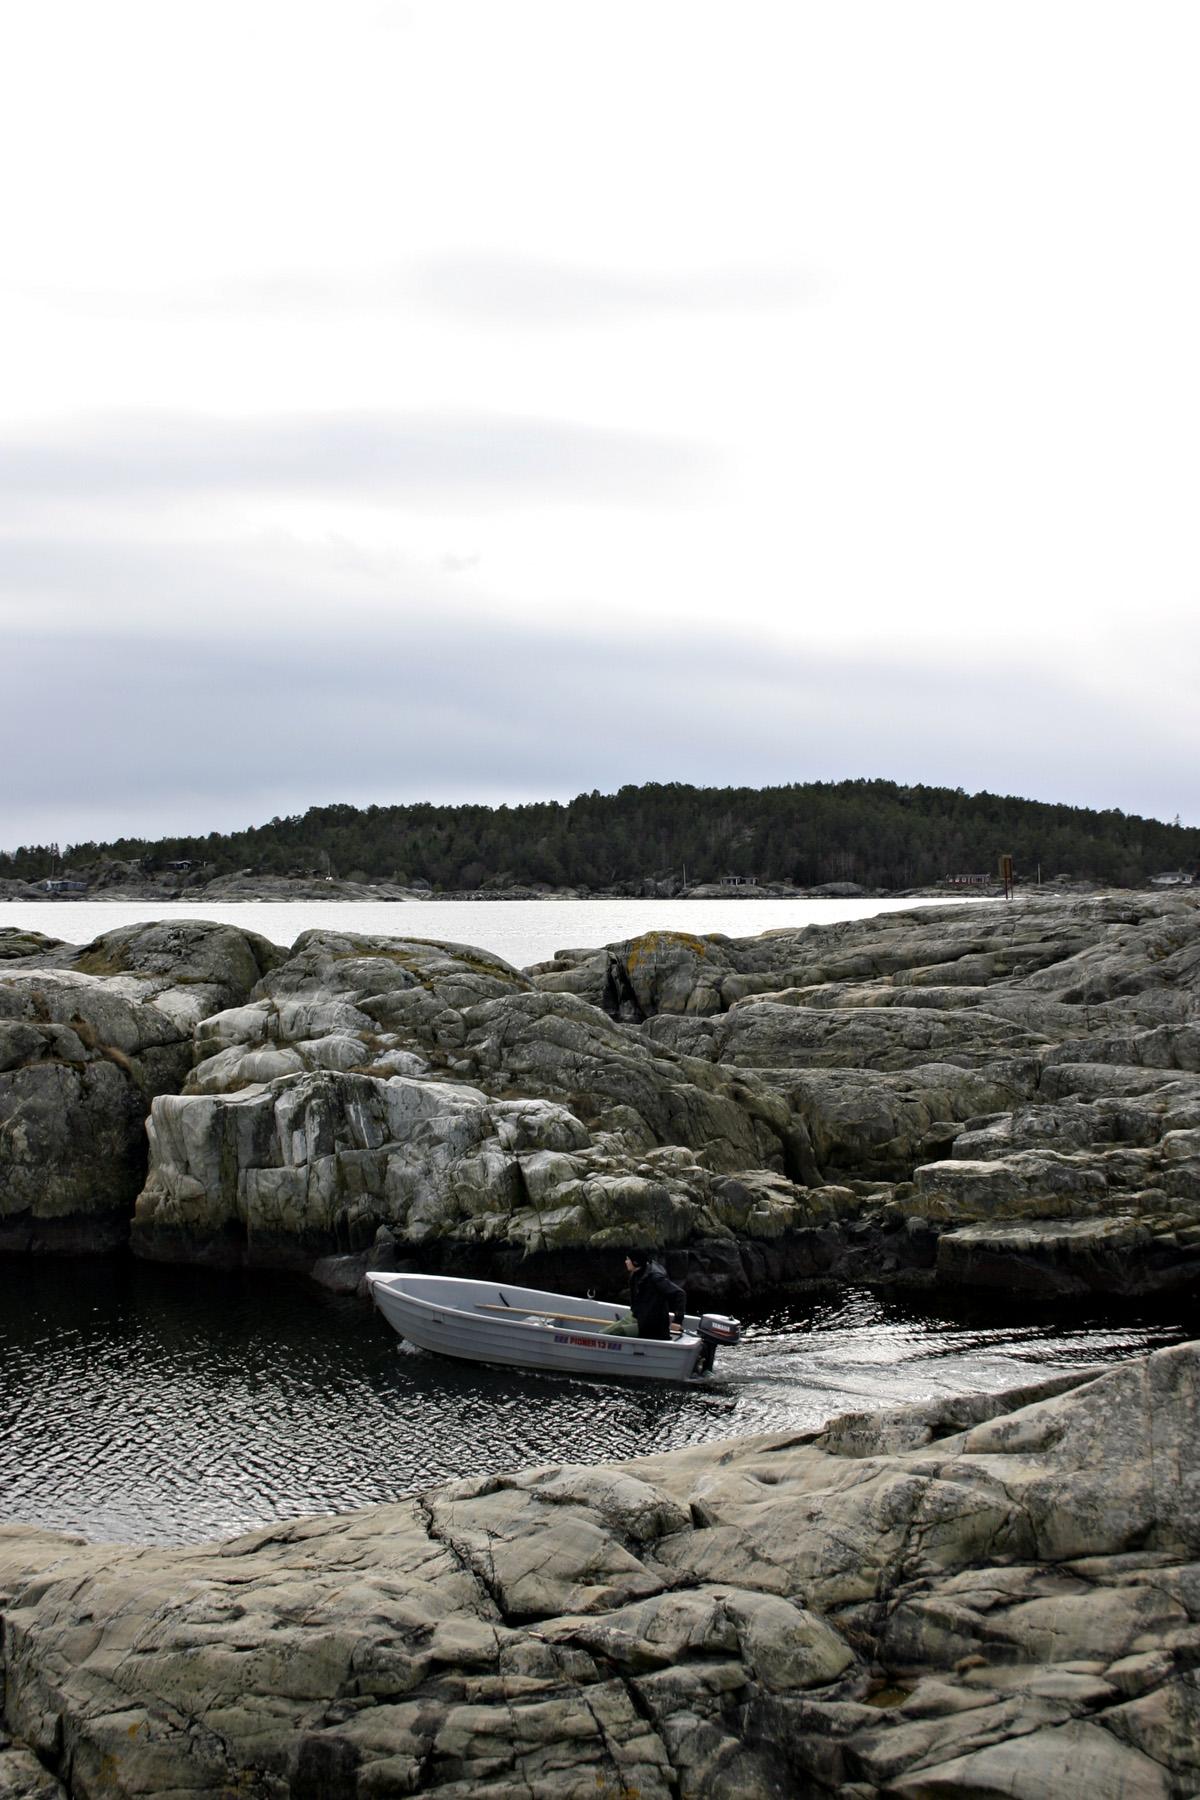 Sailing between the rocks, Boat, Coast, Fast, Man, HQ Photo